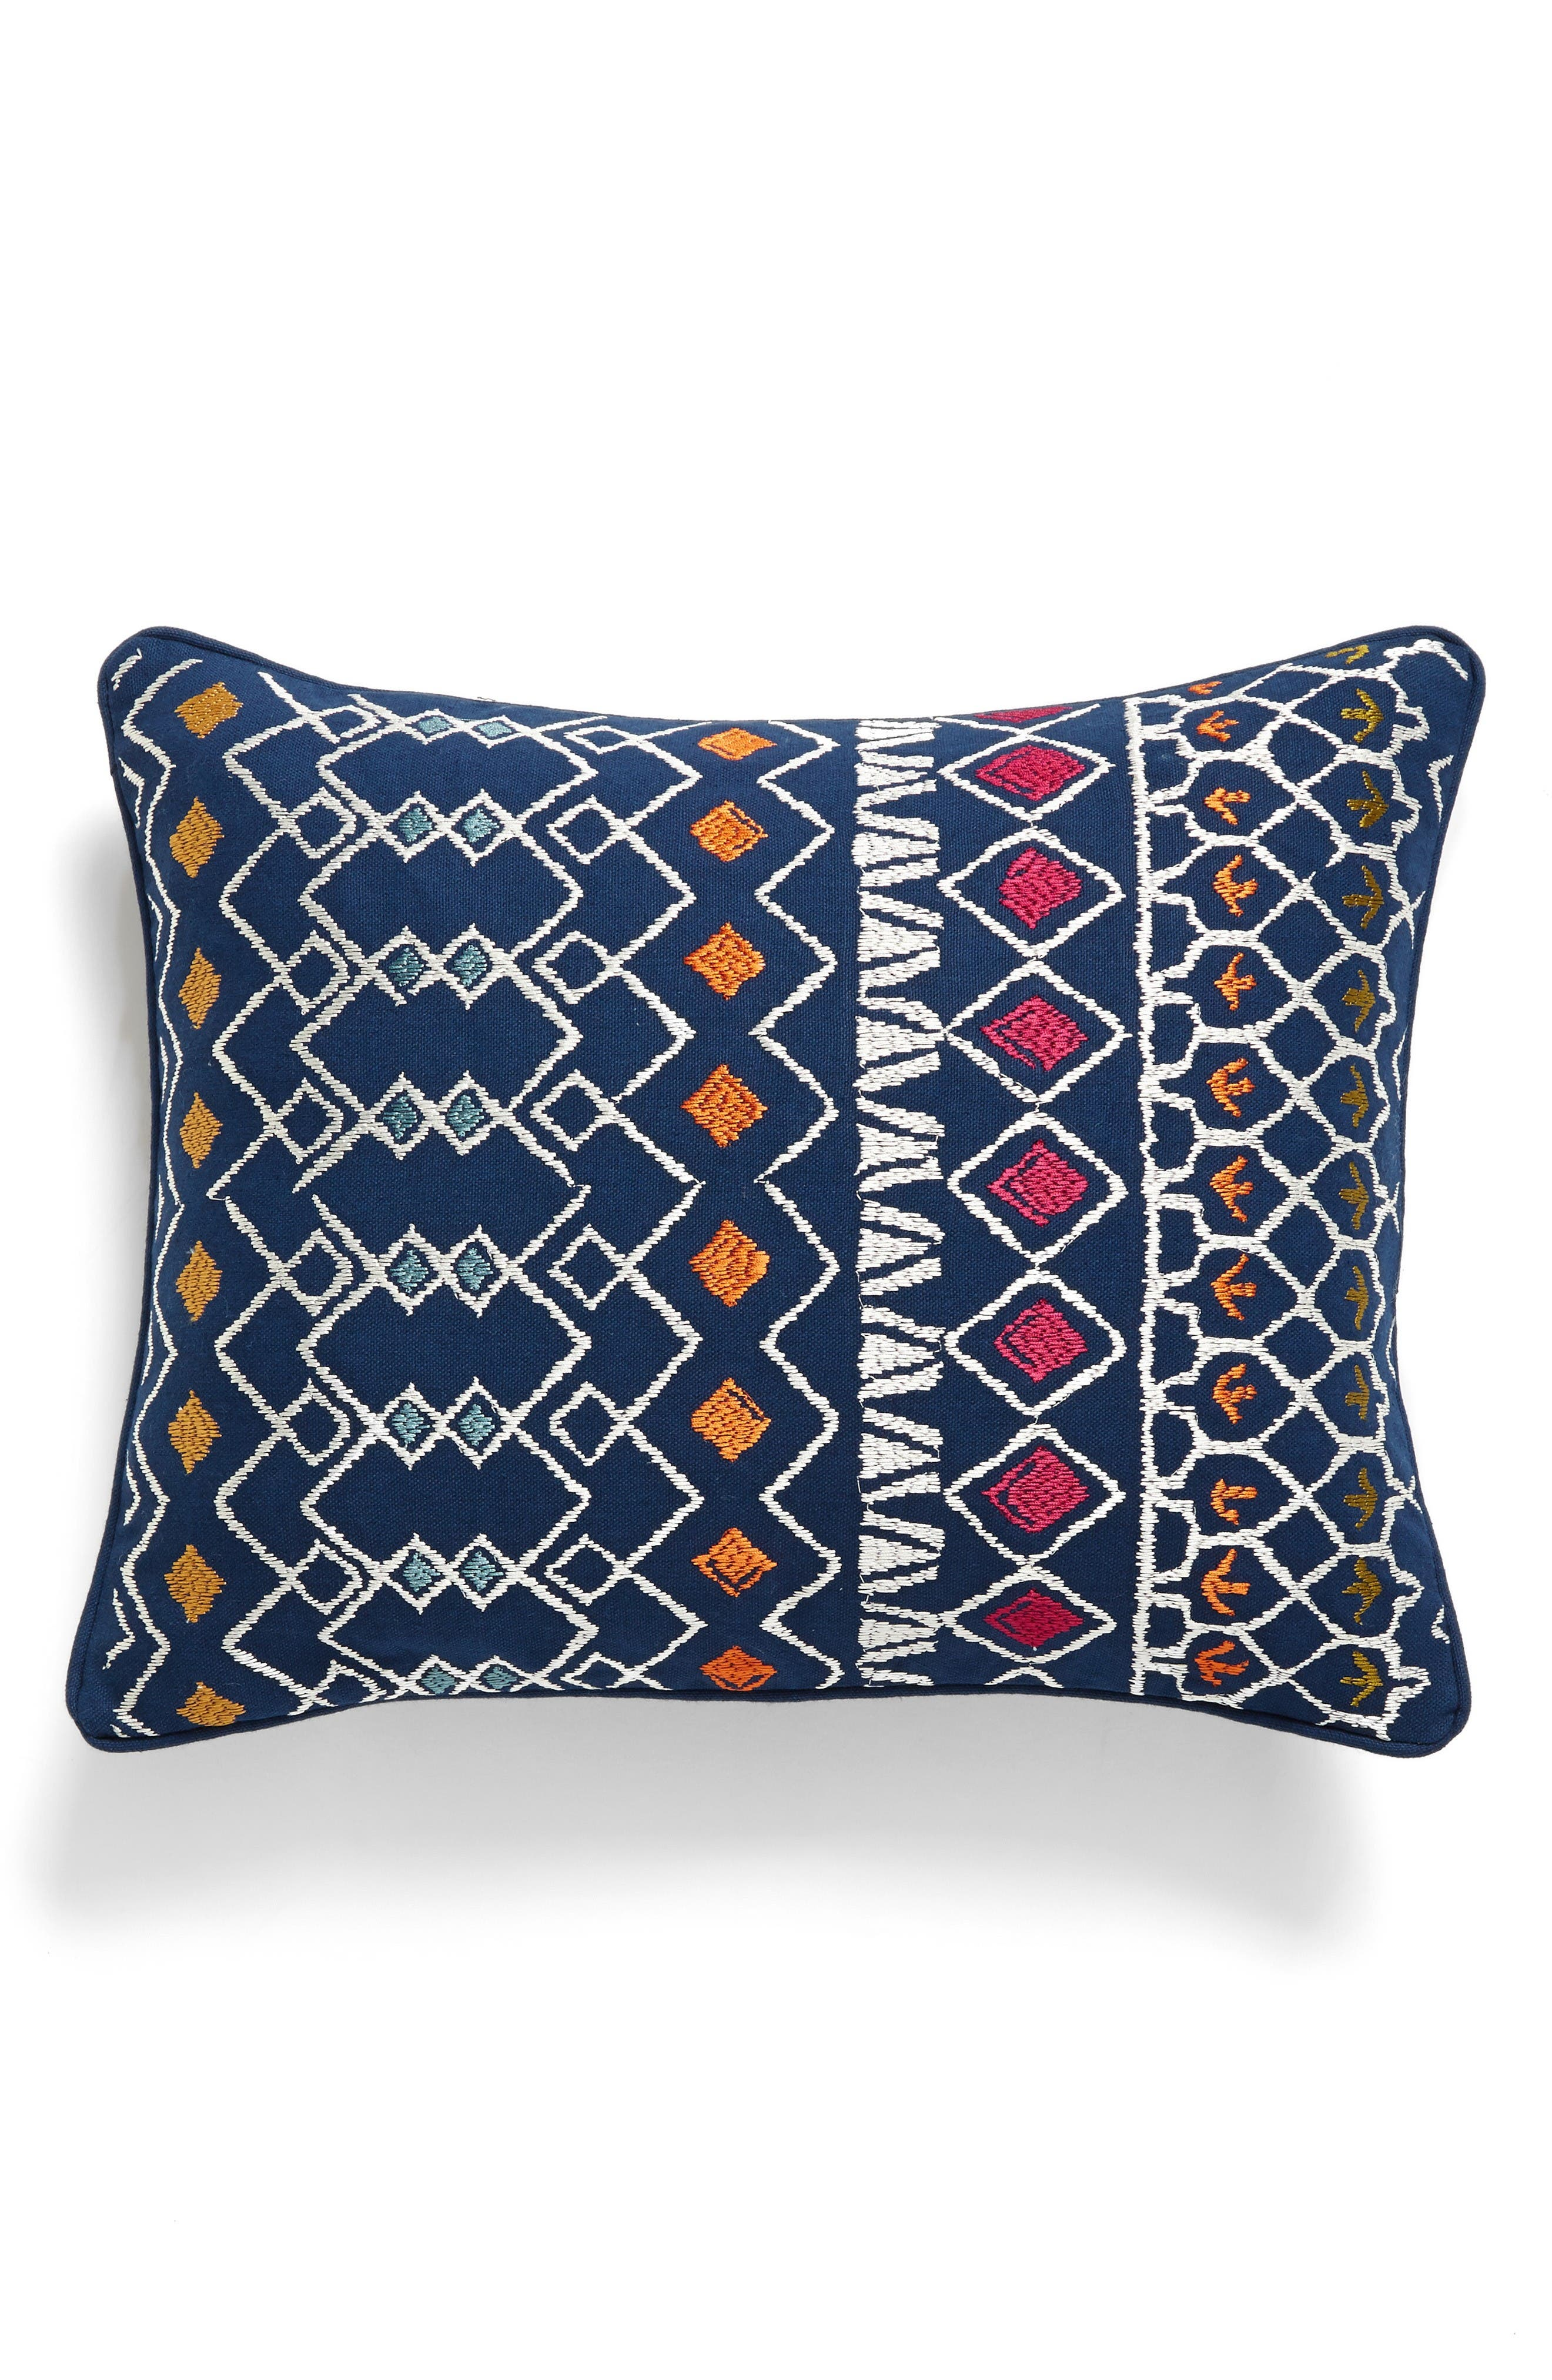 Levtex Cordelia Accent Pillow